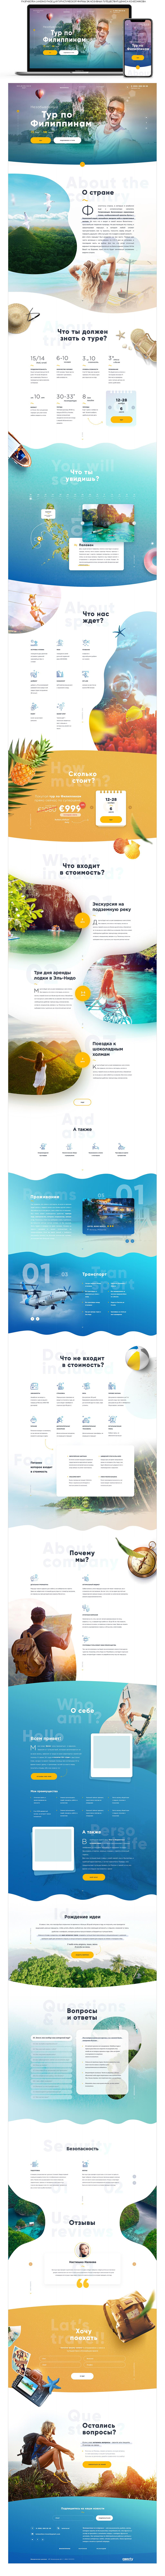 Landing page для туристической фирмы Kolesnikov Travel